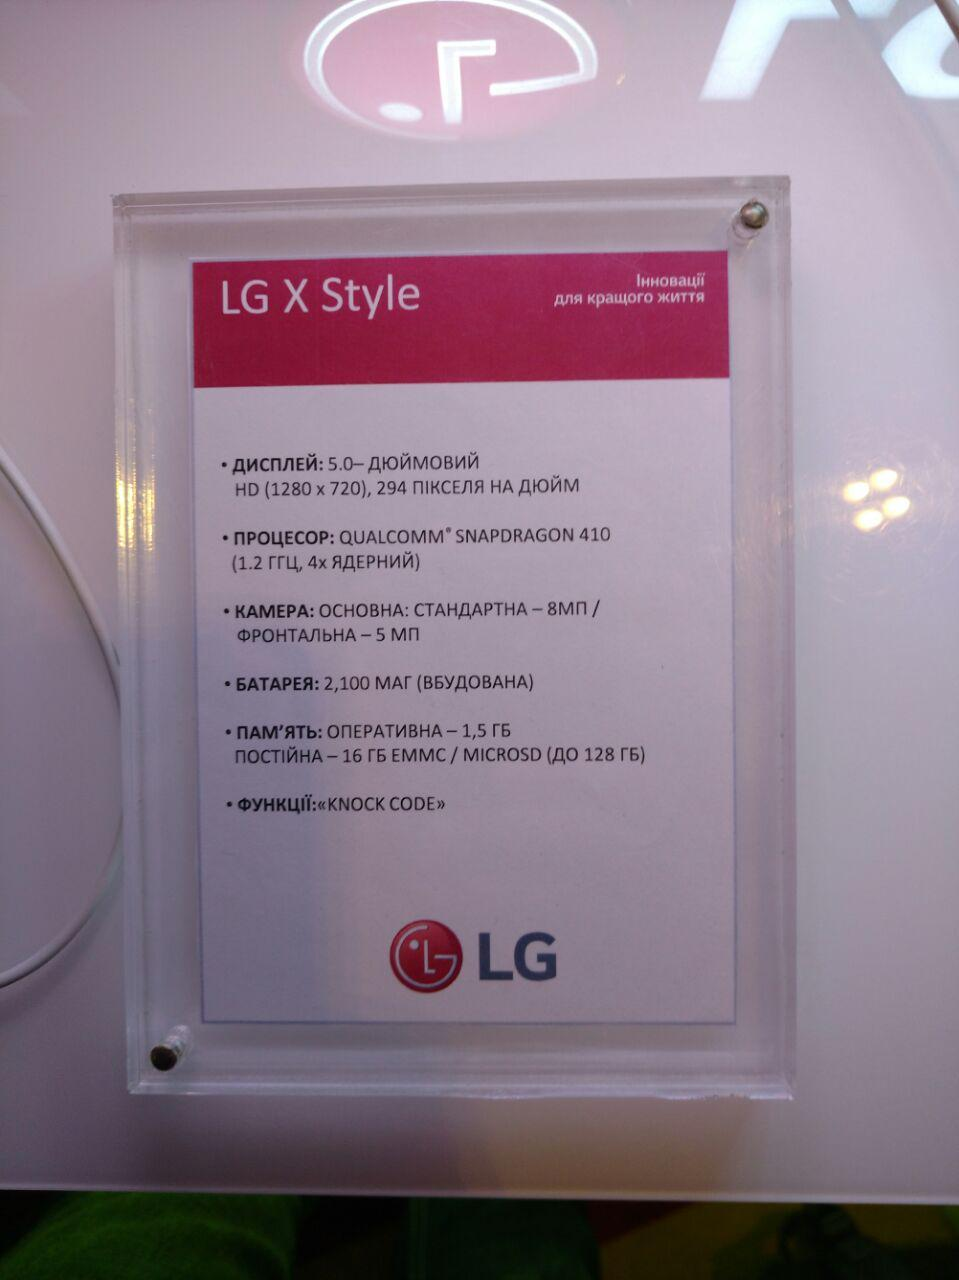 LG X Style, X Power put on display in Ukraine - SlashGear